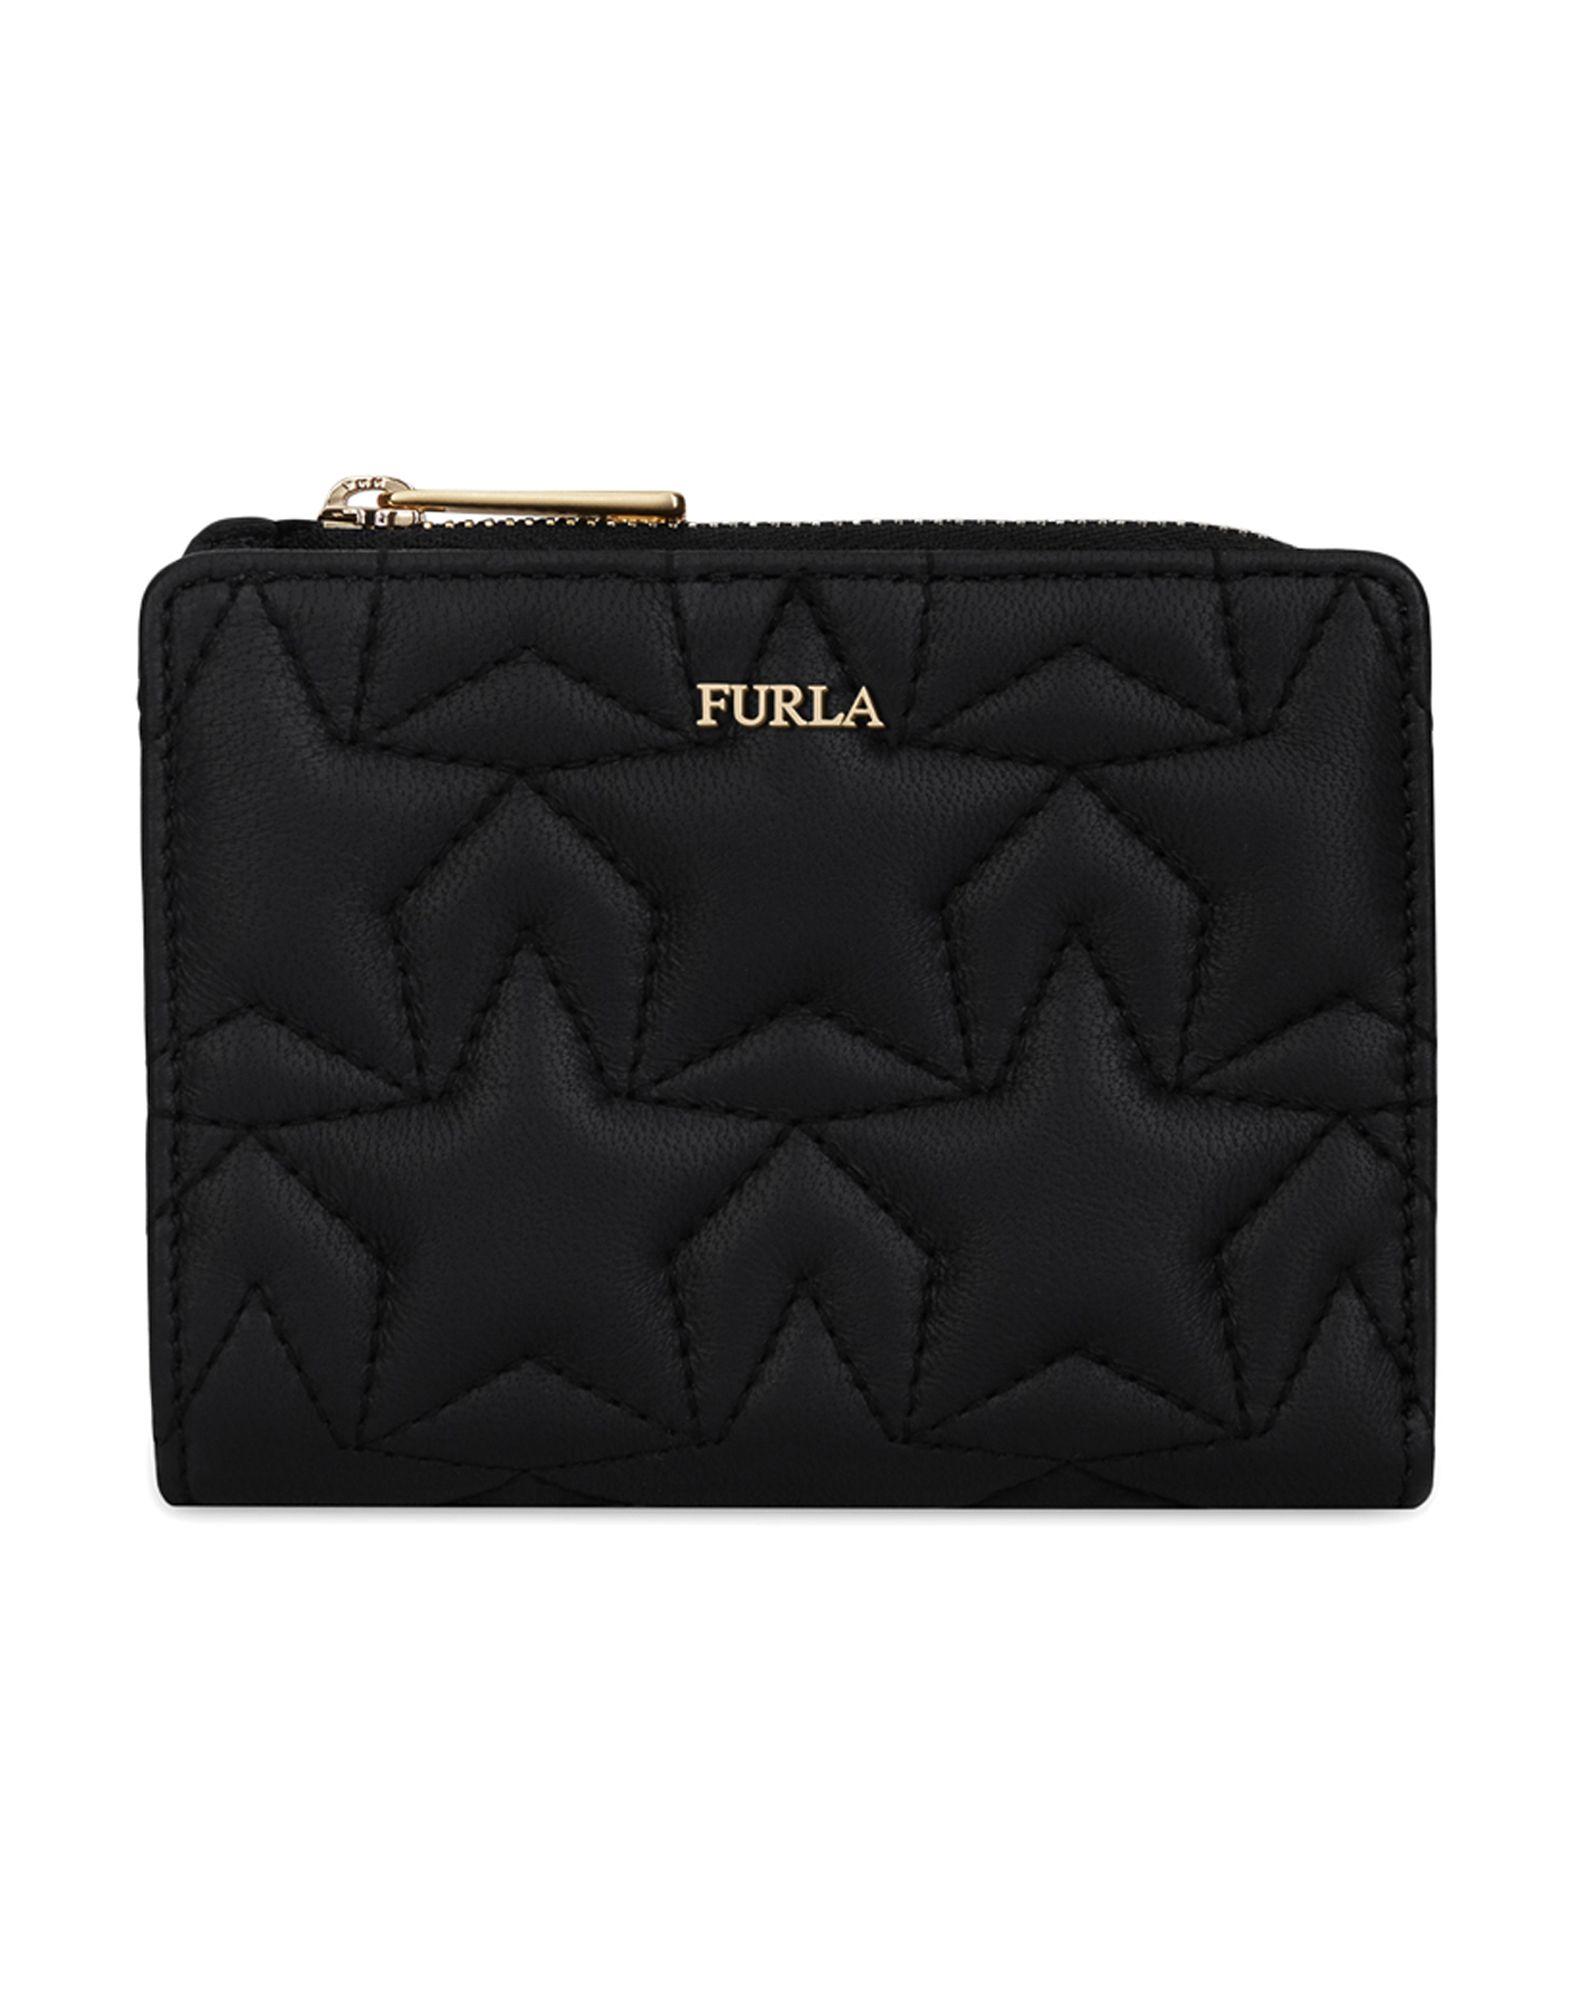 5371c35158e3 フルラ(FURLA) 財布   通販・人気ランキング - 価格.com